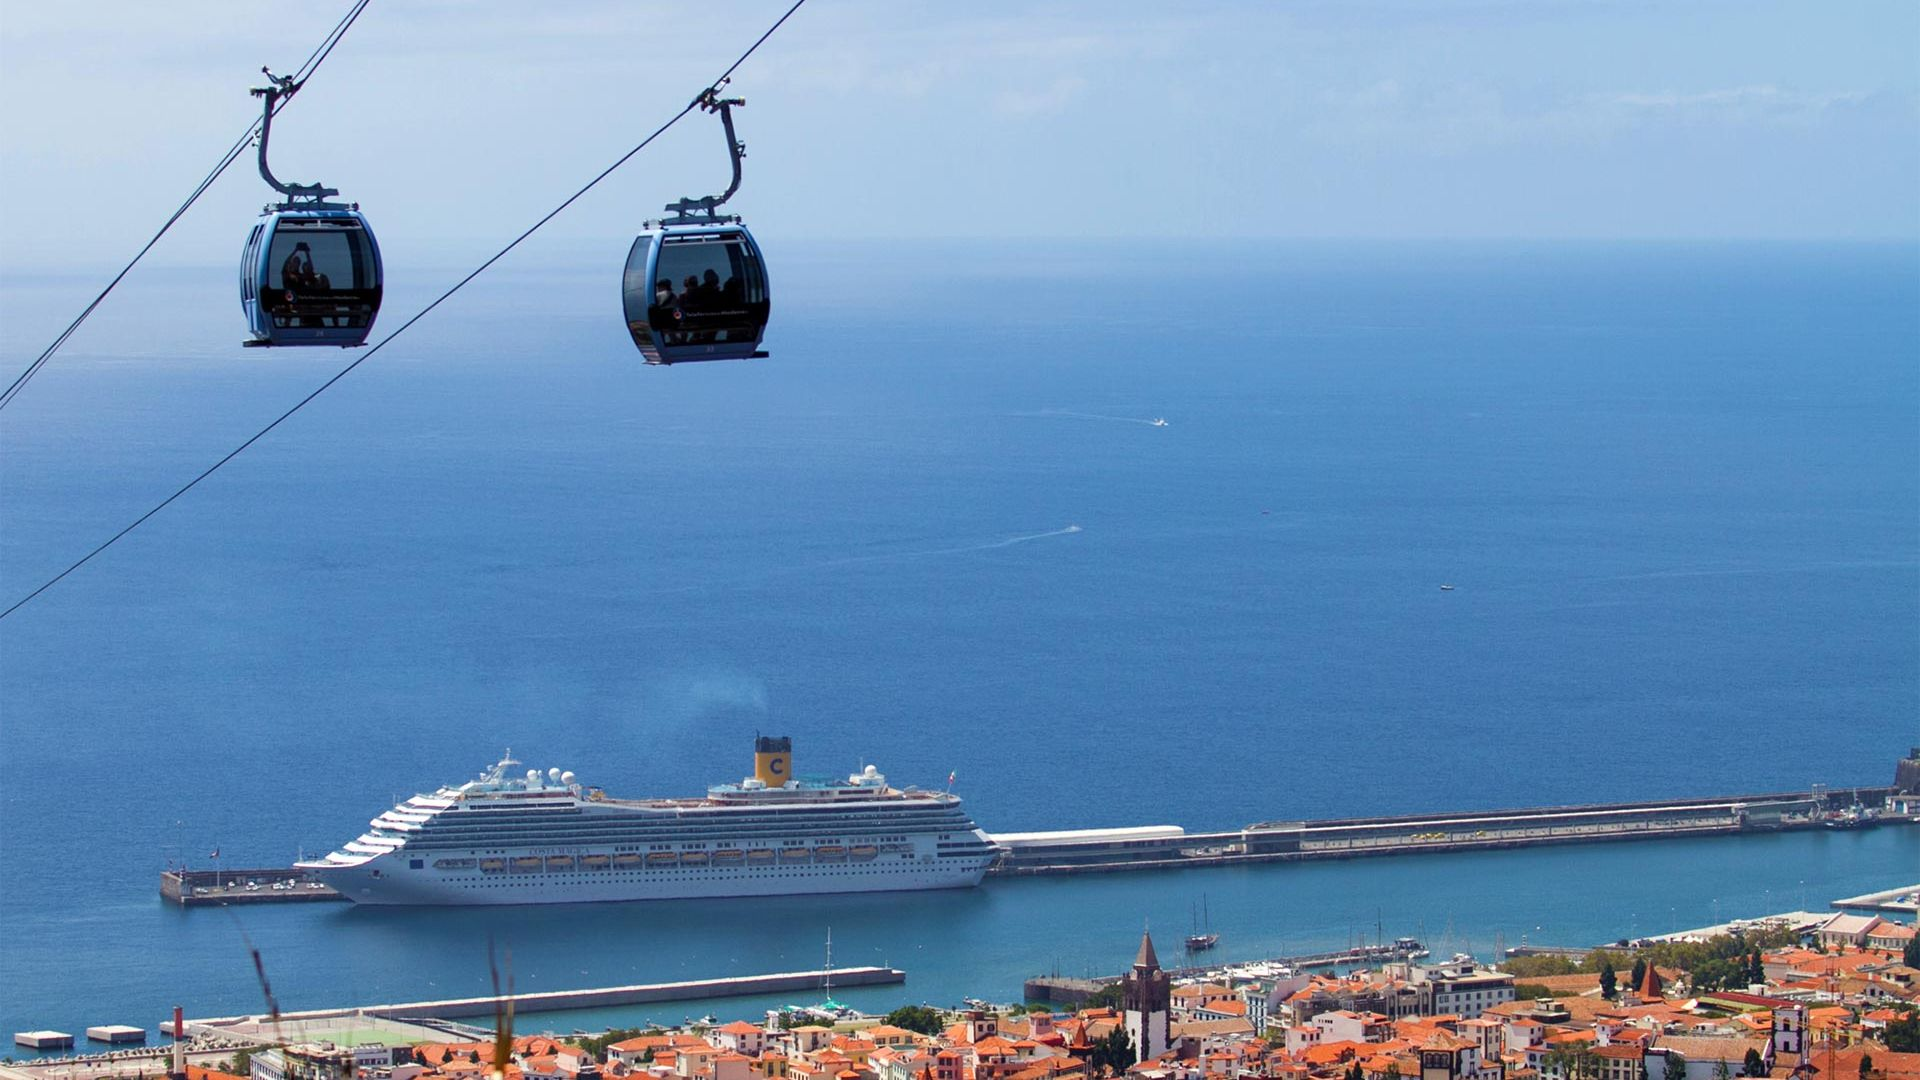 Sejur plaja Savoy Signature Madeira, 8 zile - 25 septembrie 2021